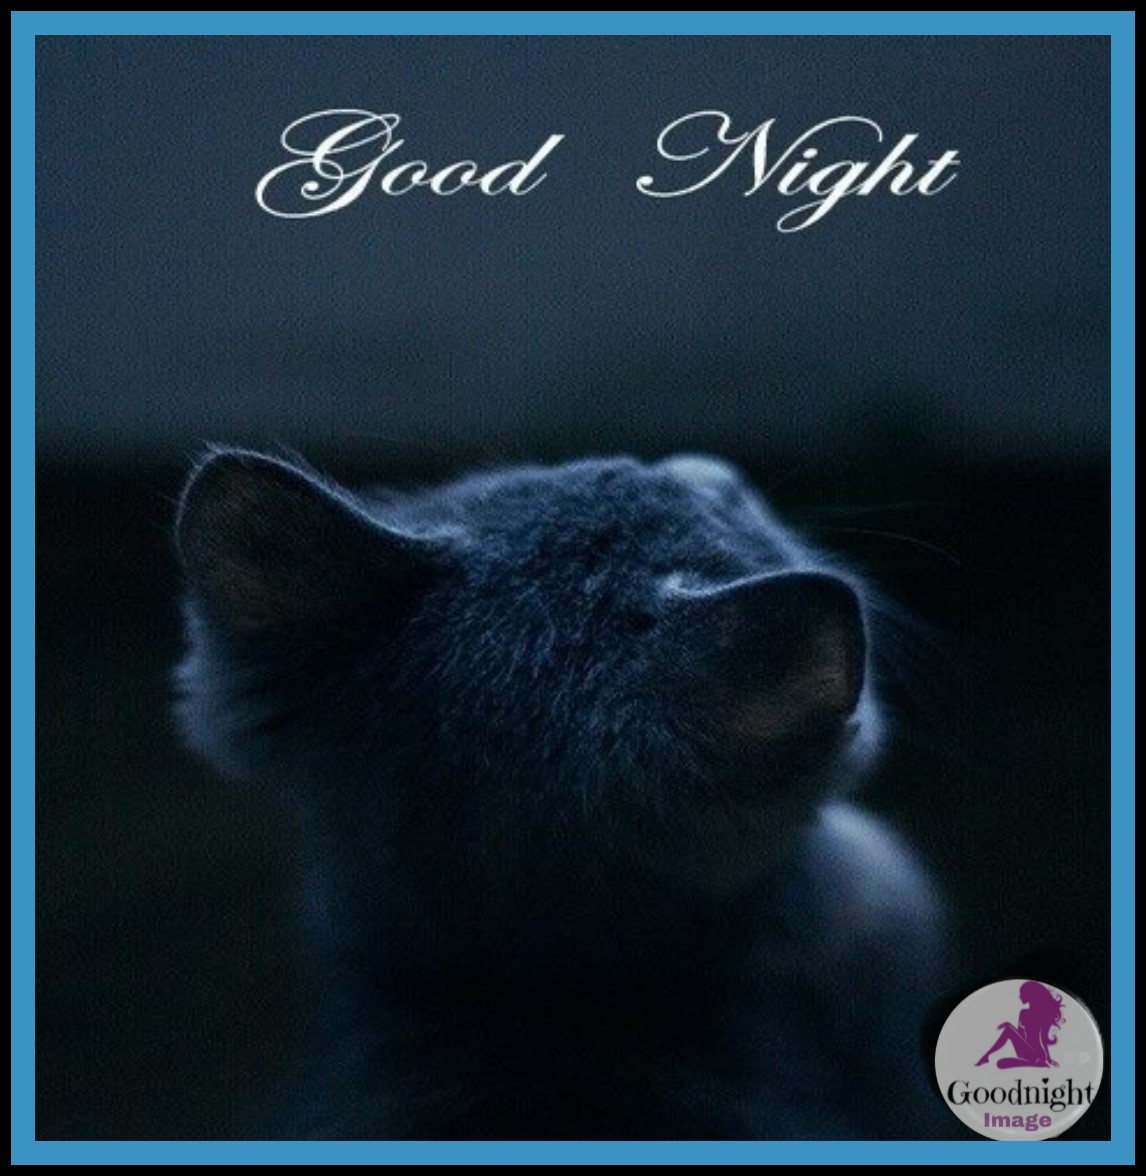 Good Night%2BImage 18